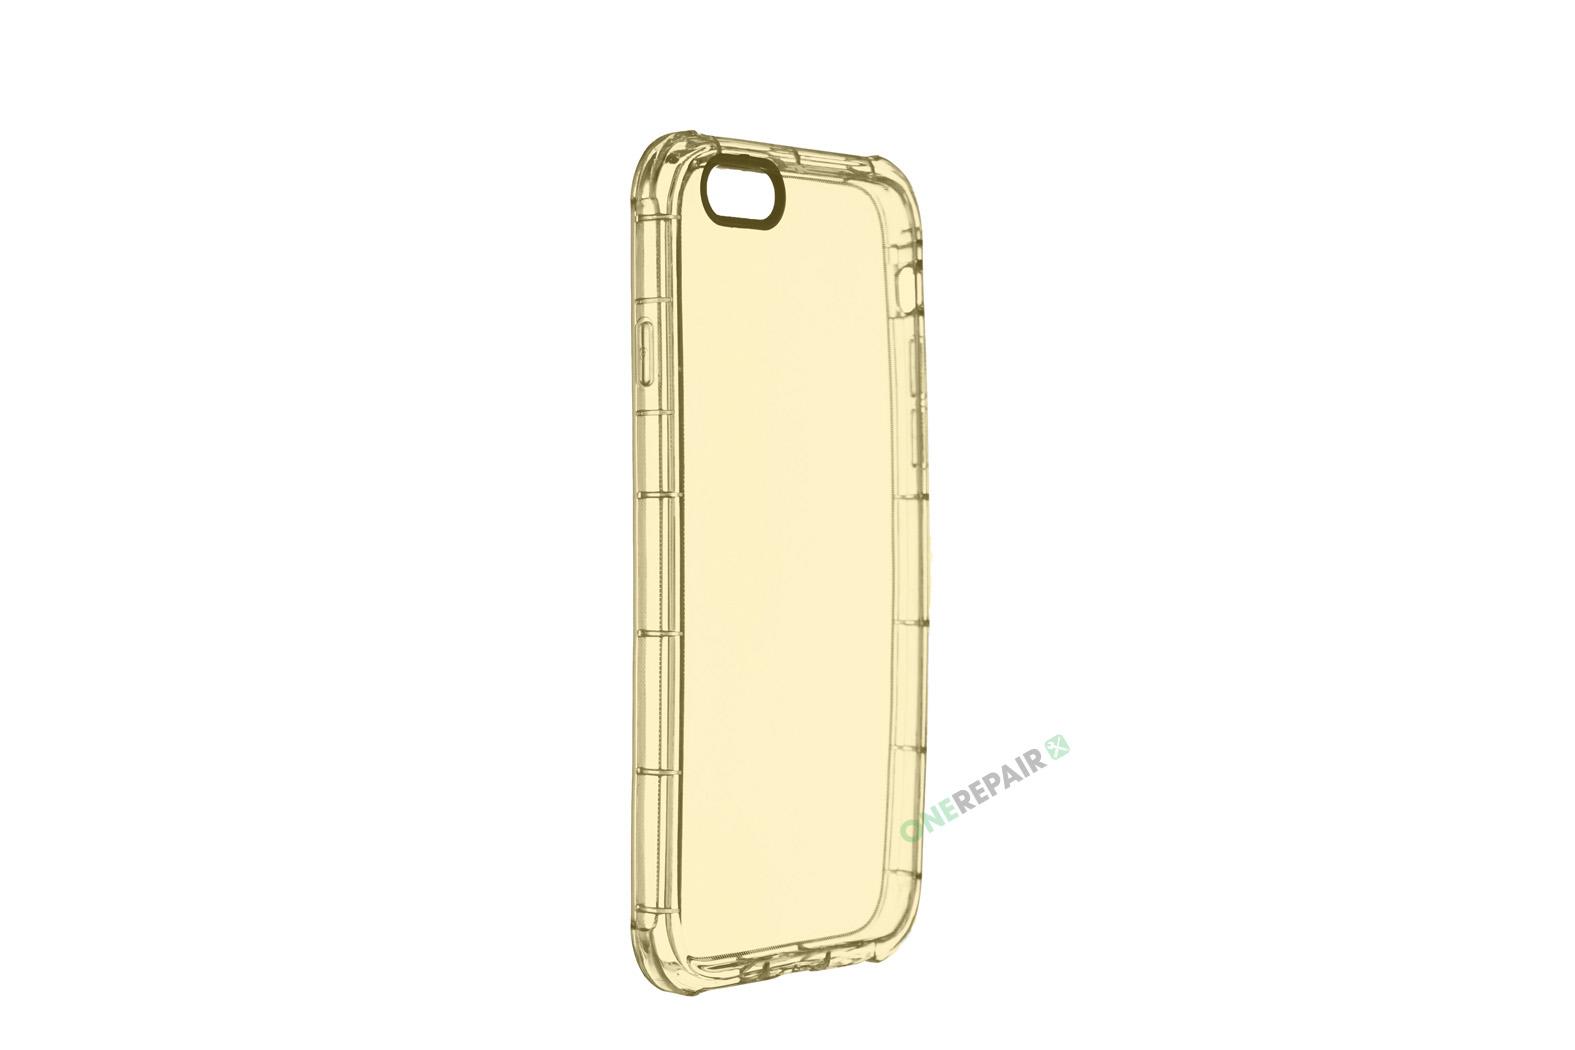 350564_iPhone_6_6s_Thick_Gummicover_Gennemsigtig_Guld_Gul_Gummi_Cover_Bagcover_Billig_OneRepair_WM_00002